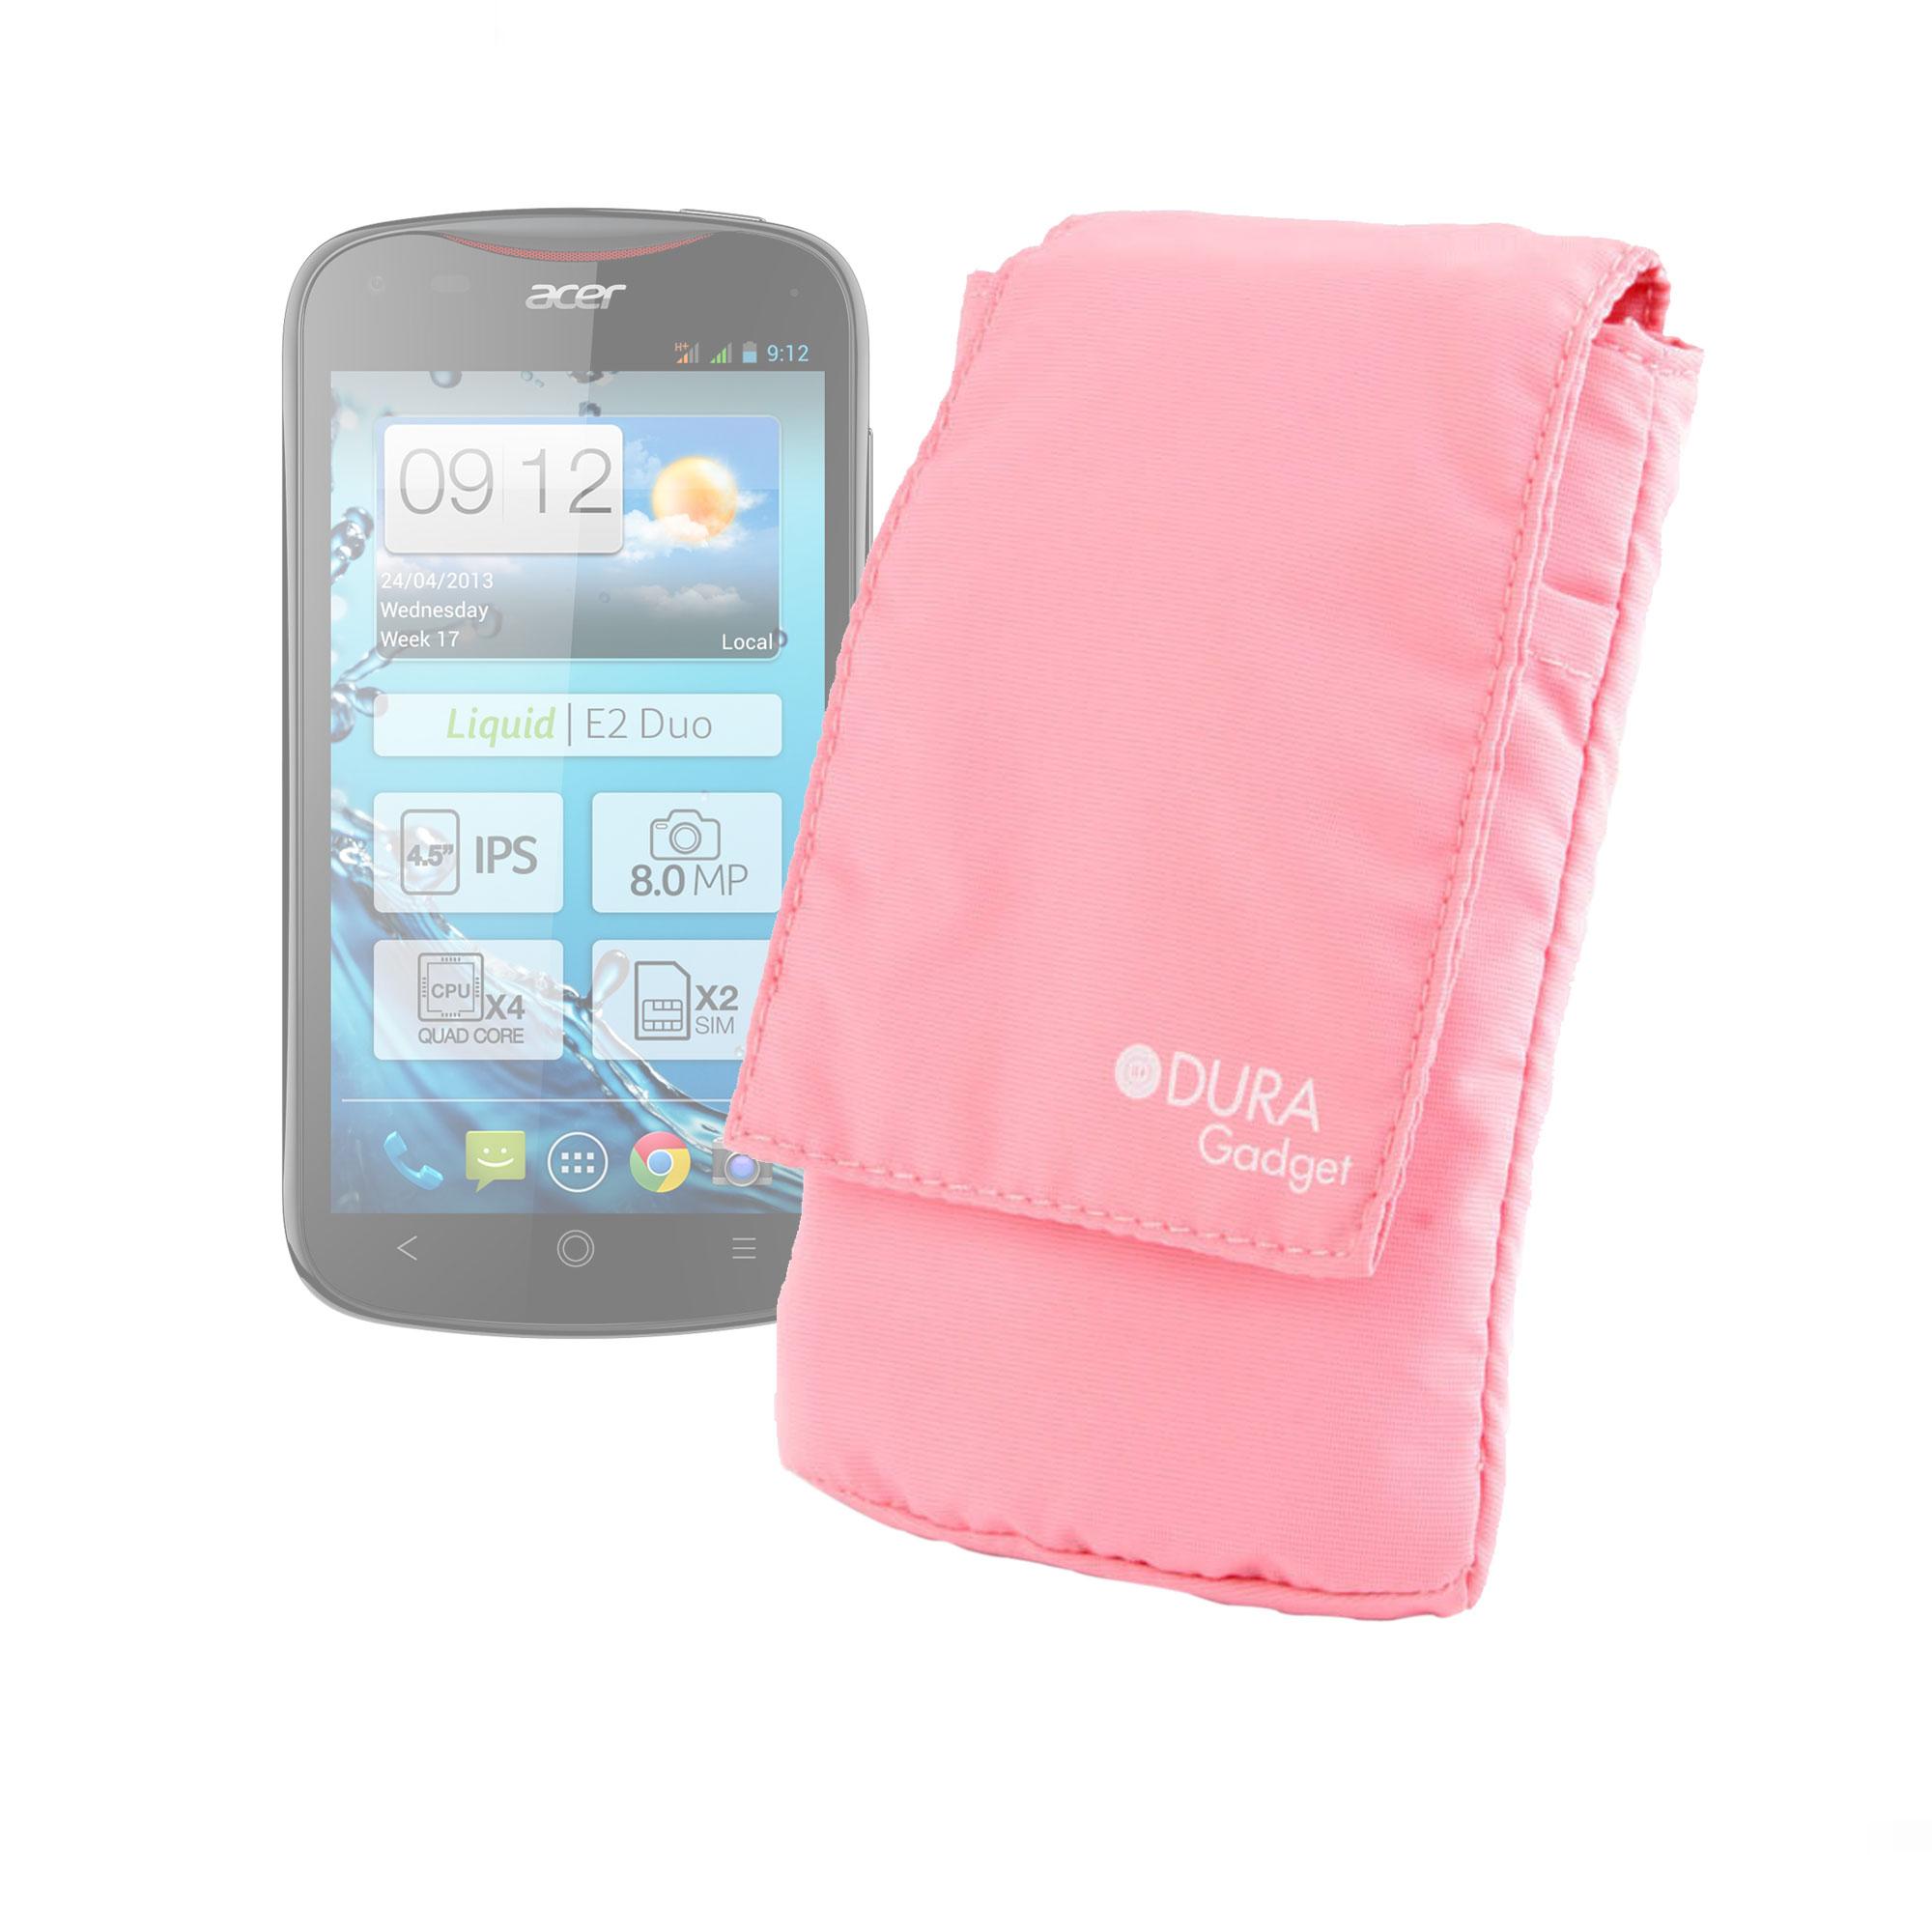 etui housse pour smartphones acer liquid z3 e2 duo liquid gallant e350 ebay